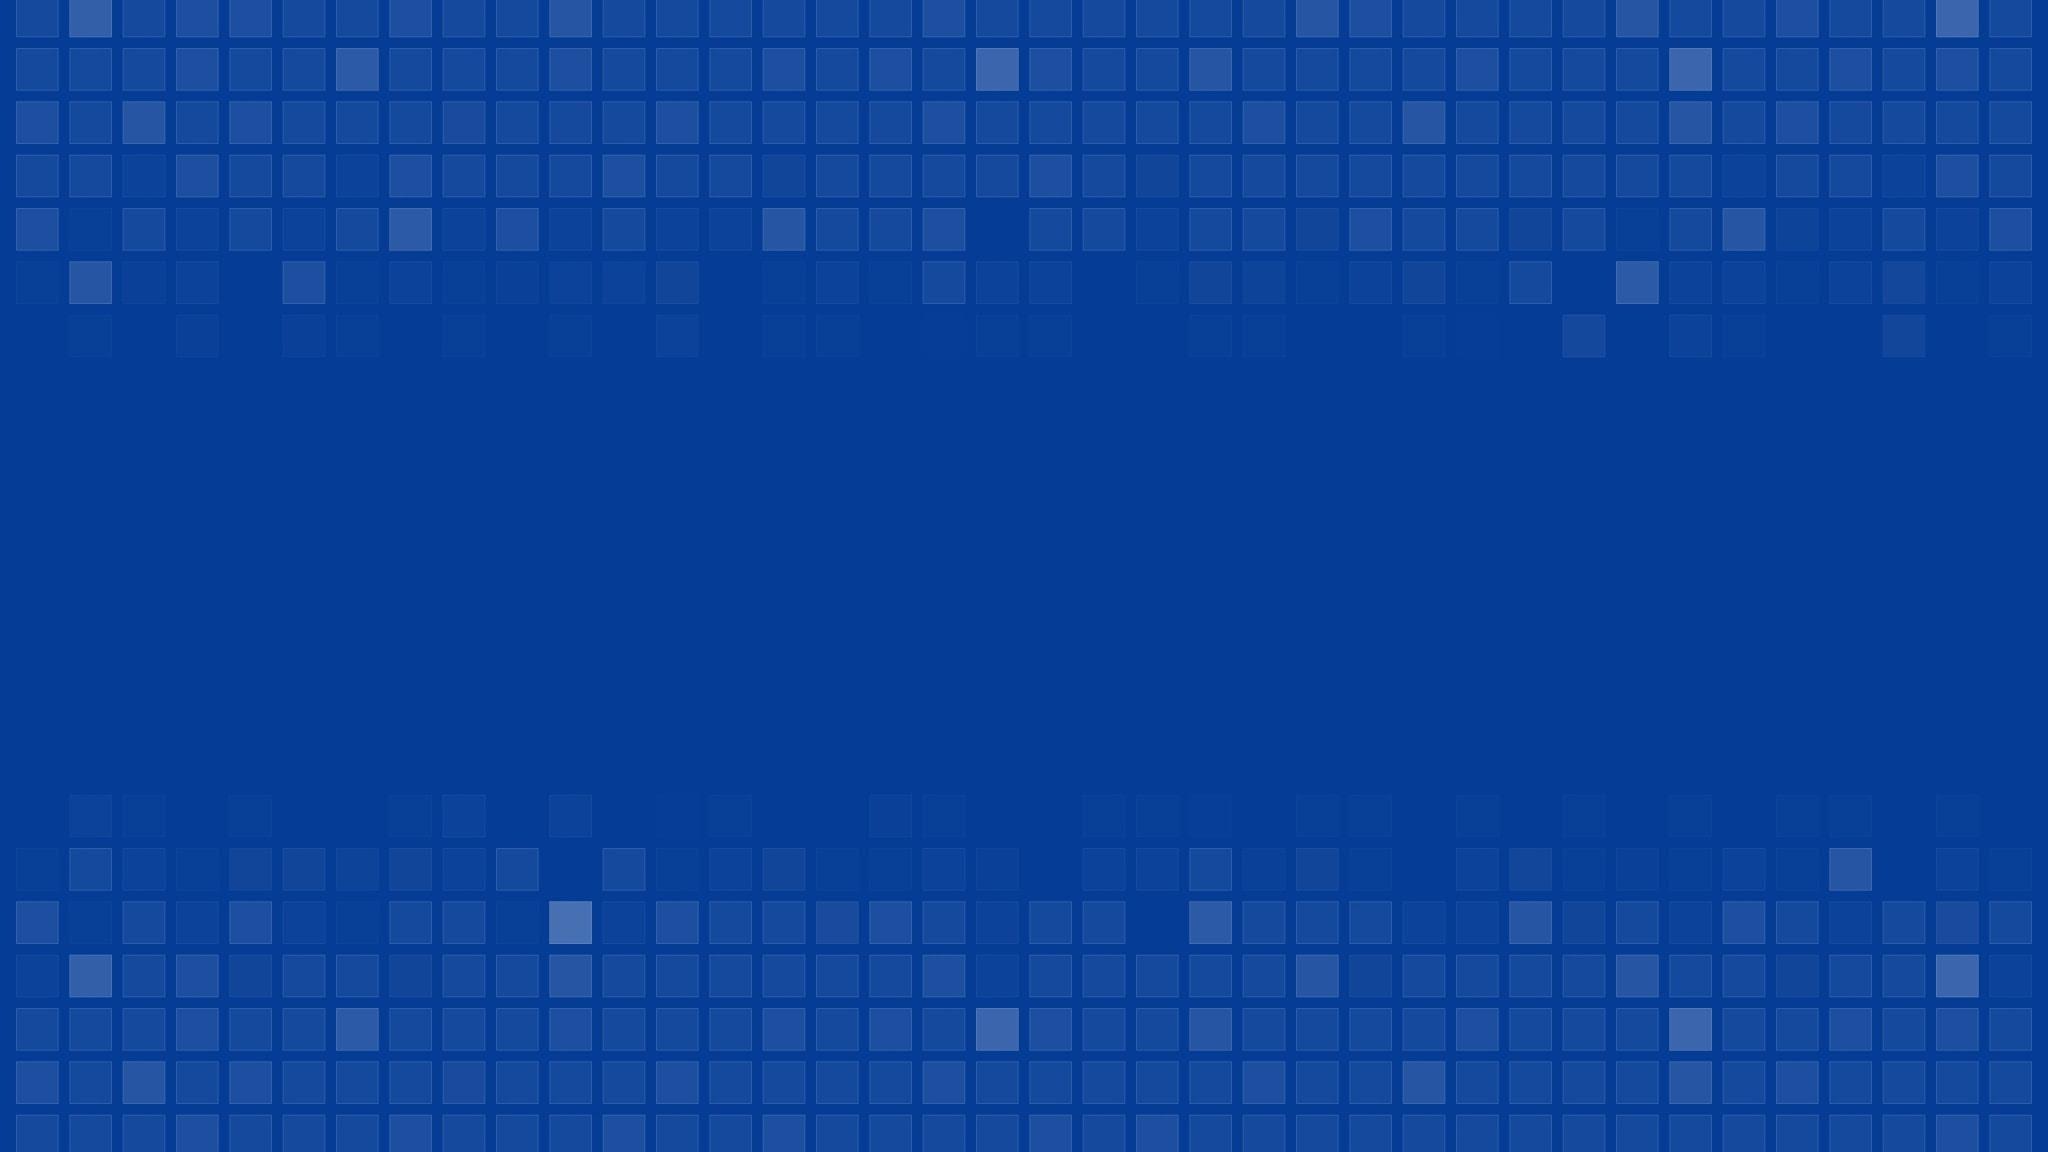 Unduh 4100 Background Blue Hd Gratis Terbaik